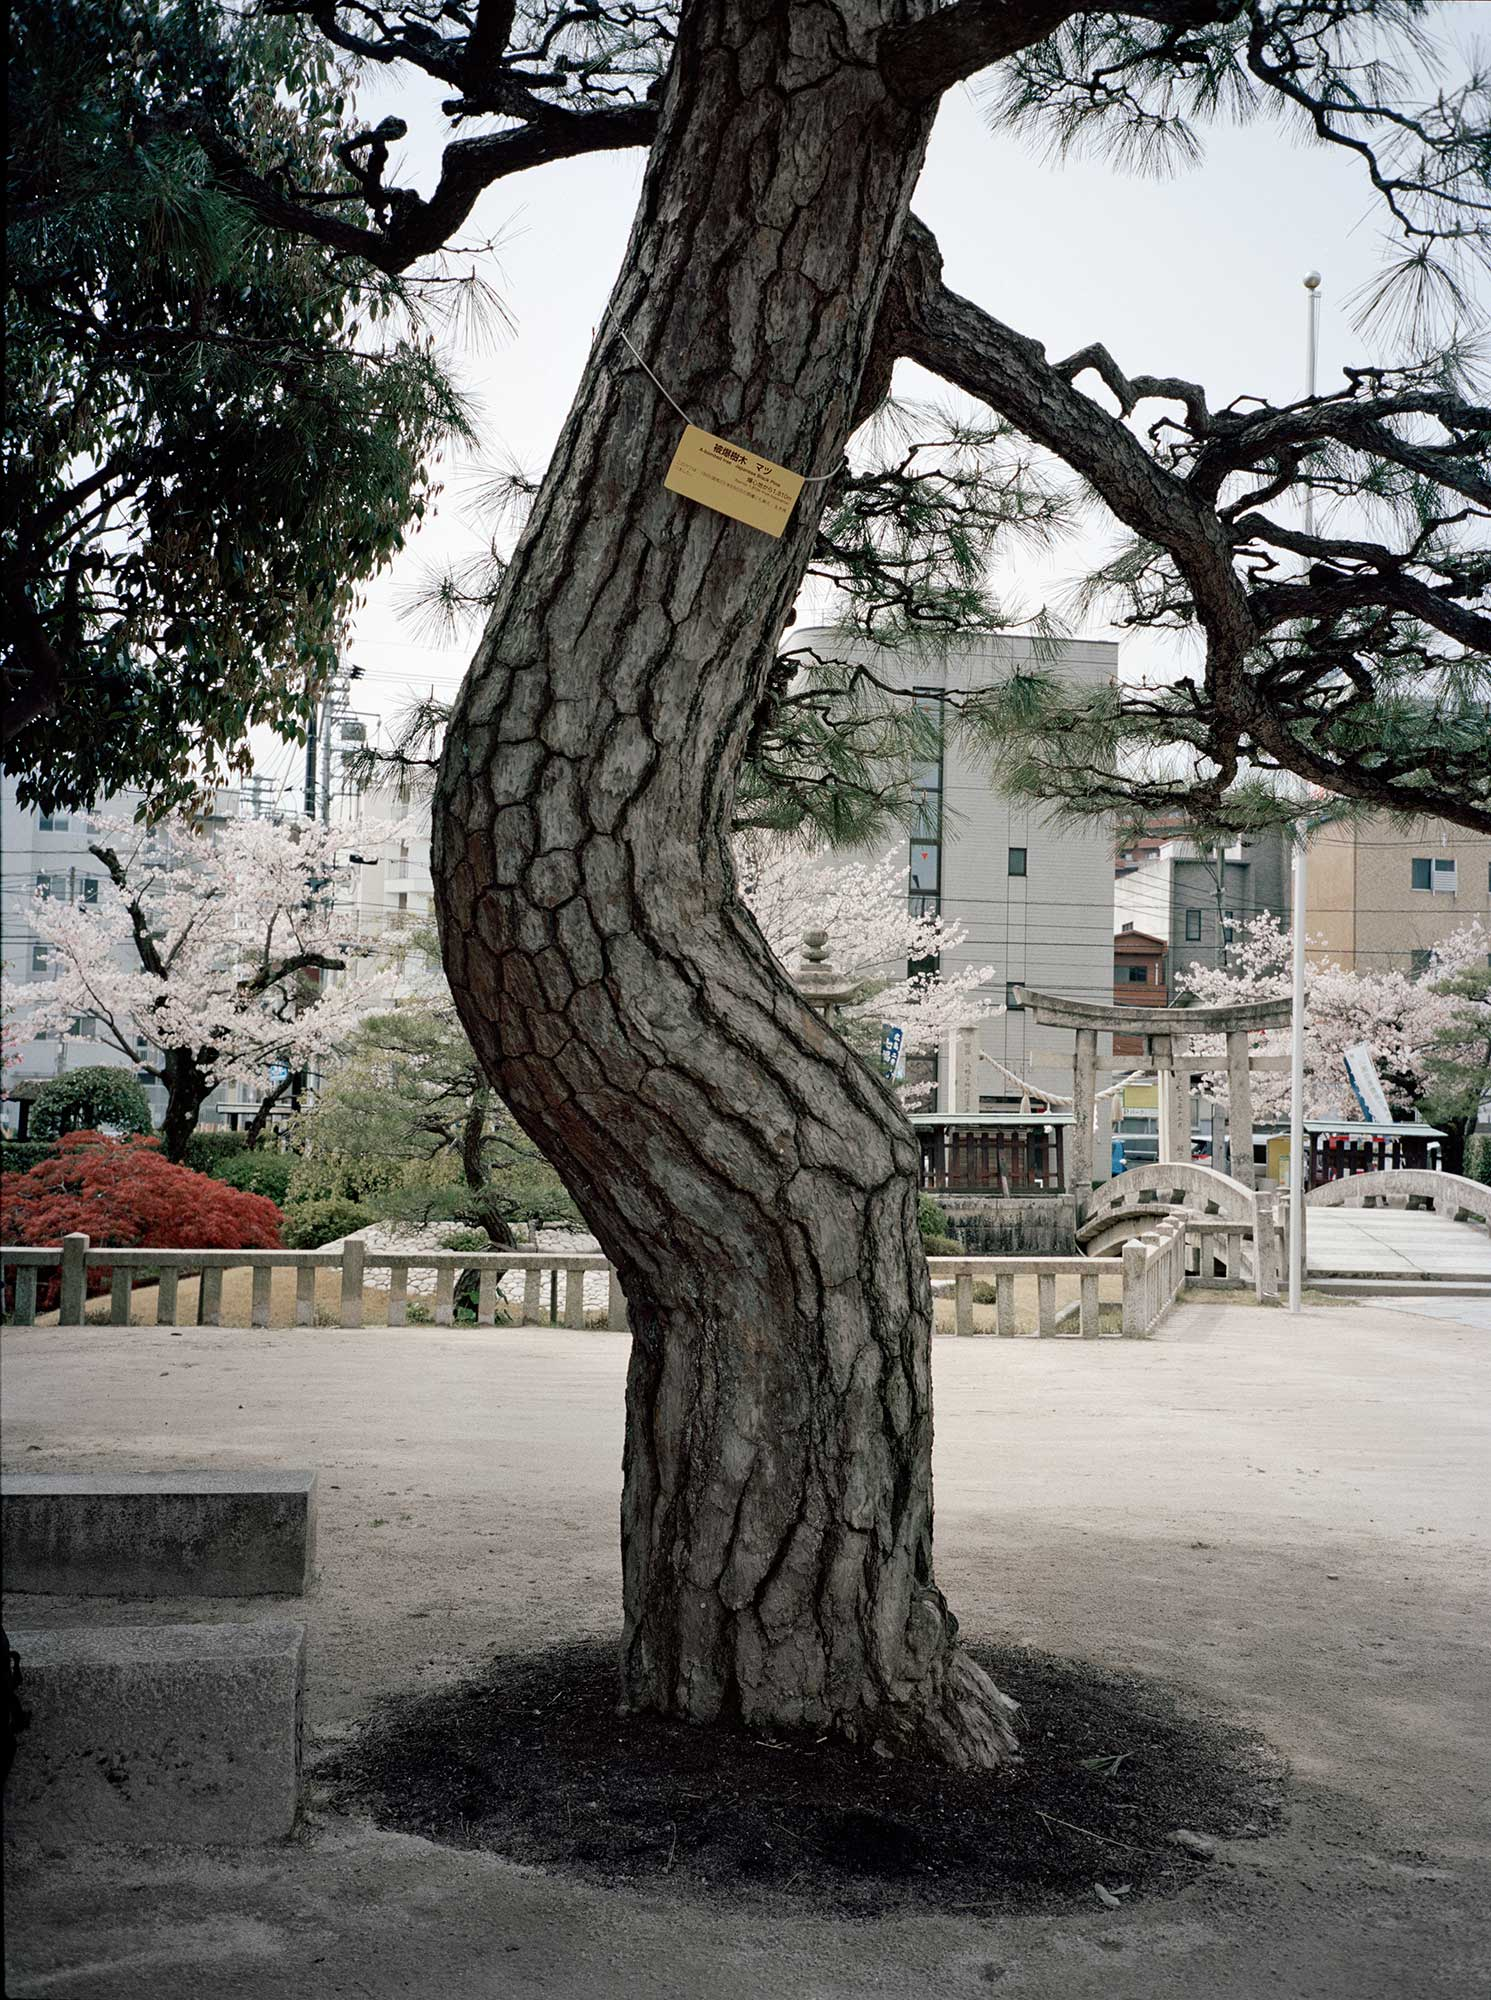 A-bombed Japanese Black Pine Tree, Tsuruhane Shrine, Hiroshima, 1810 meters from the hypocenter, 2008, Chromogenic print, 30 x 40 inch.